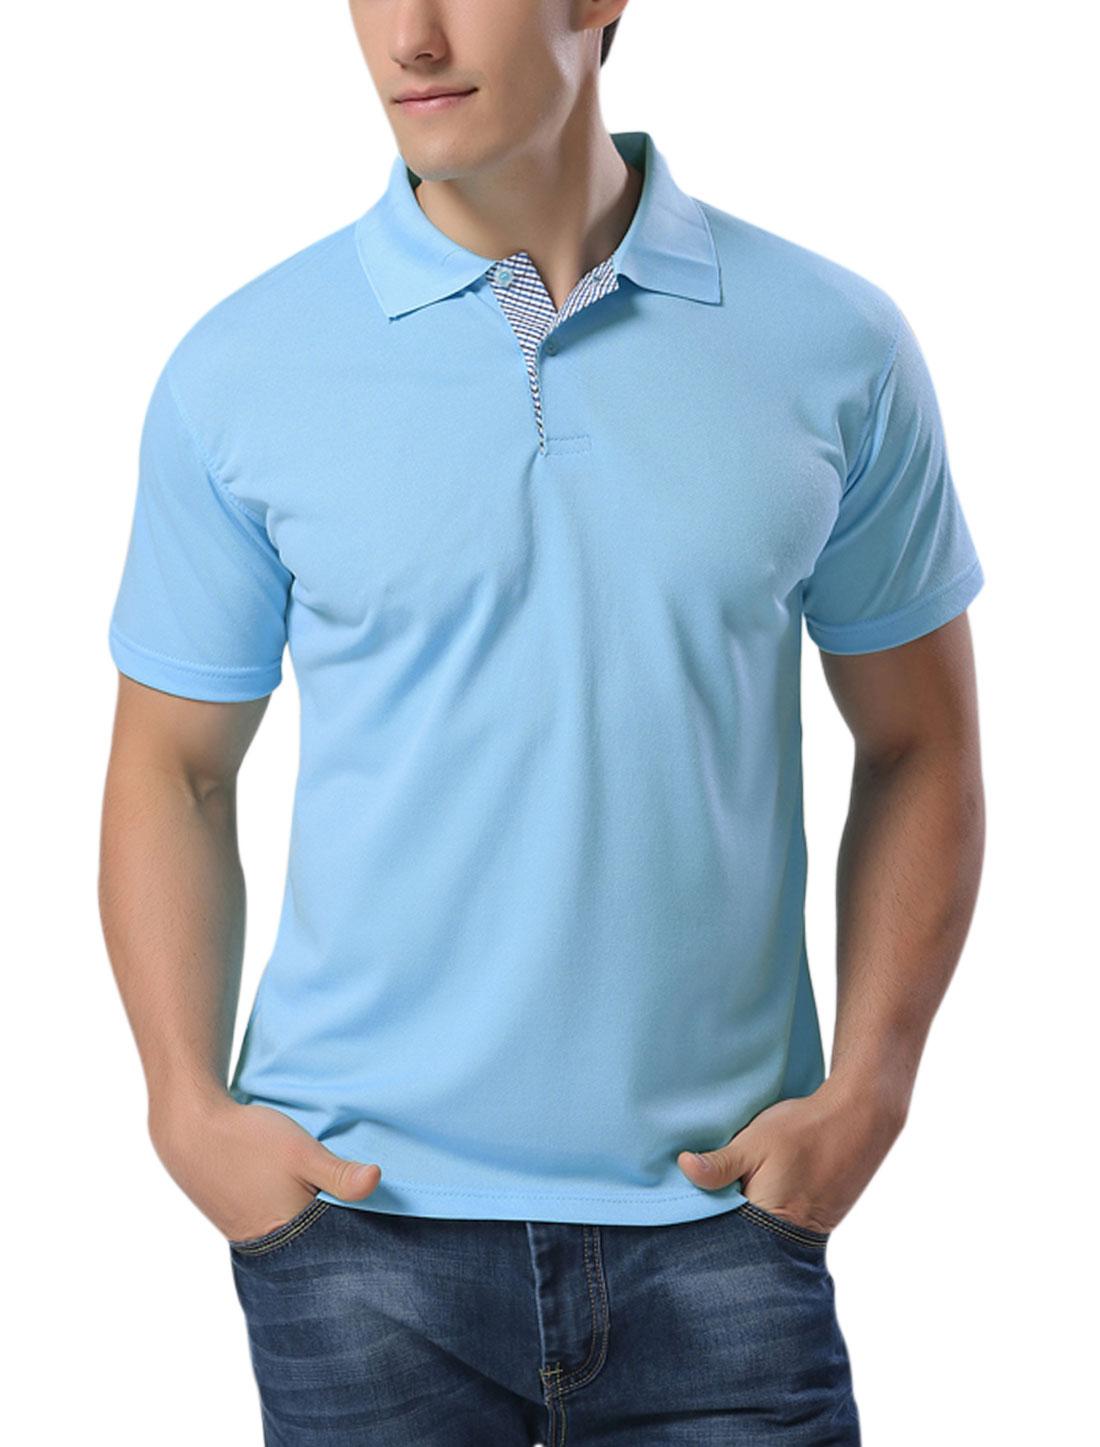 Man Point Collar Short Sleeves Sport Shirts Sky Blue L